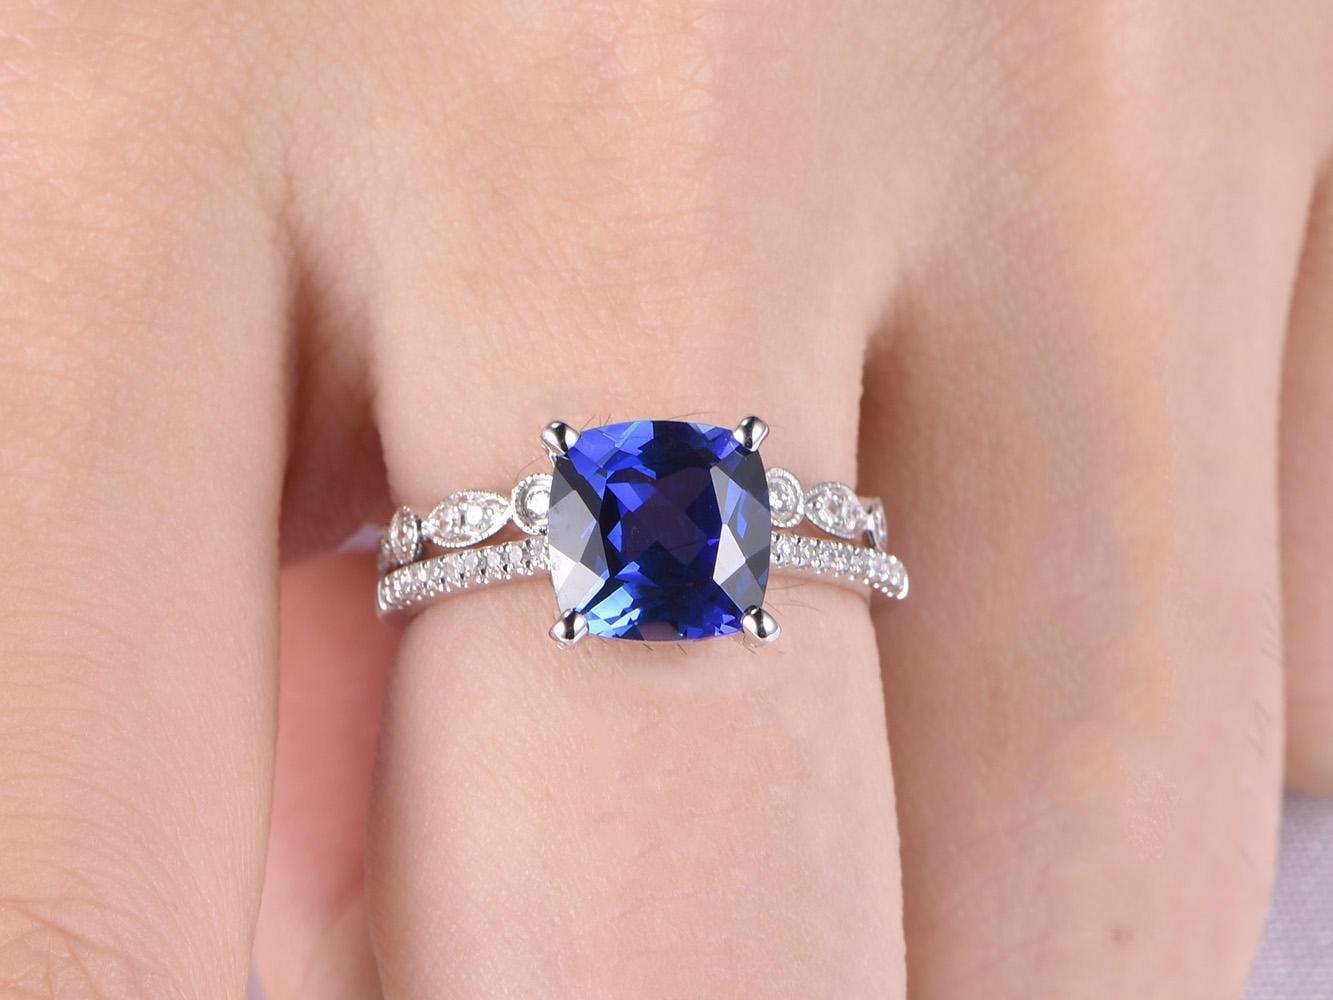 Blue Sapphire Ring Set 8mm Cushion Cut Sapphire Engagement